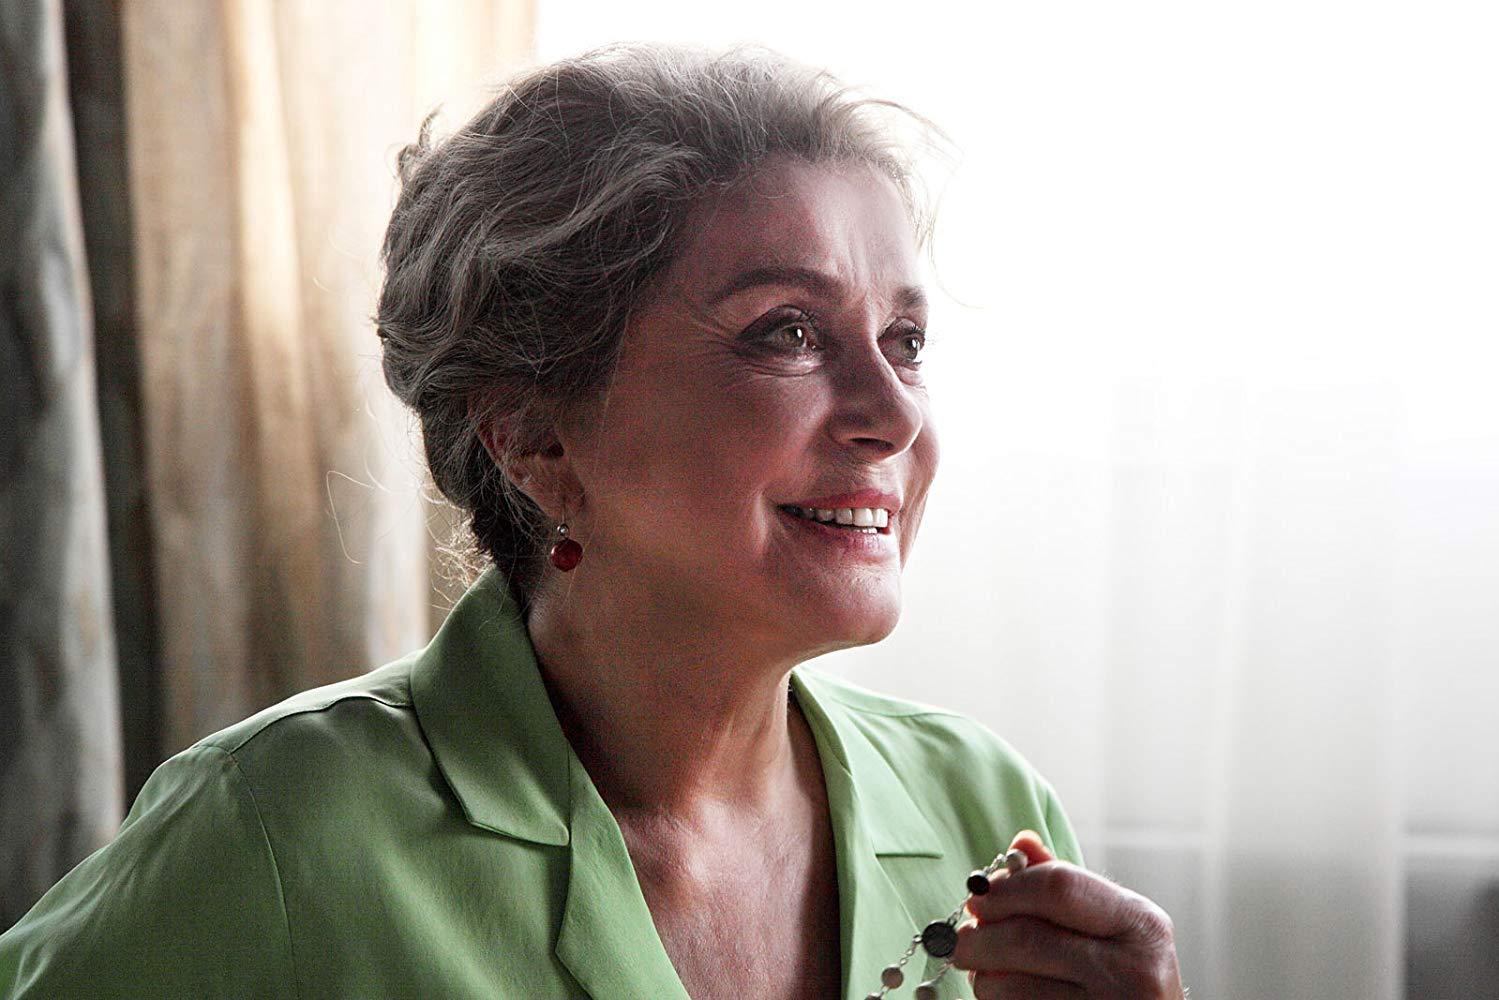 Mala Hierba (2018)